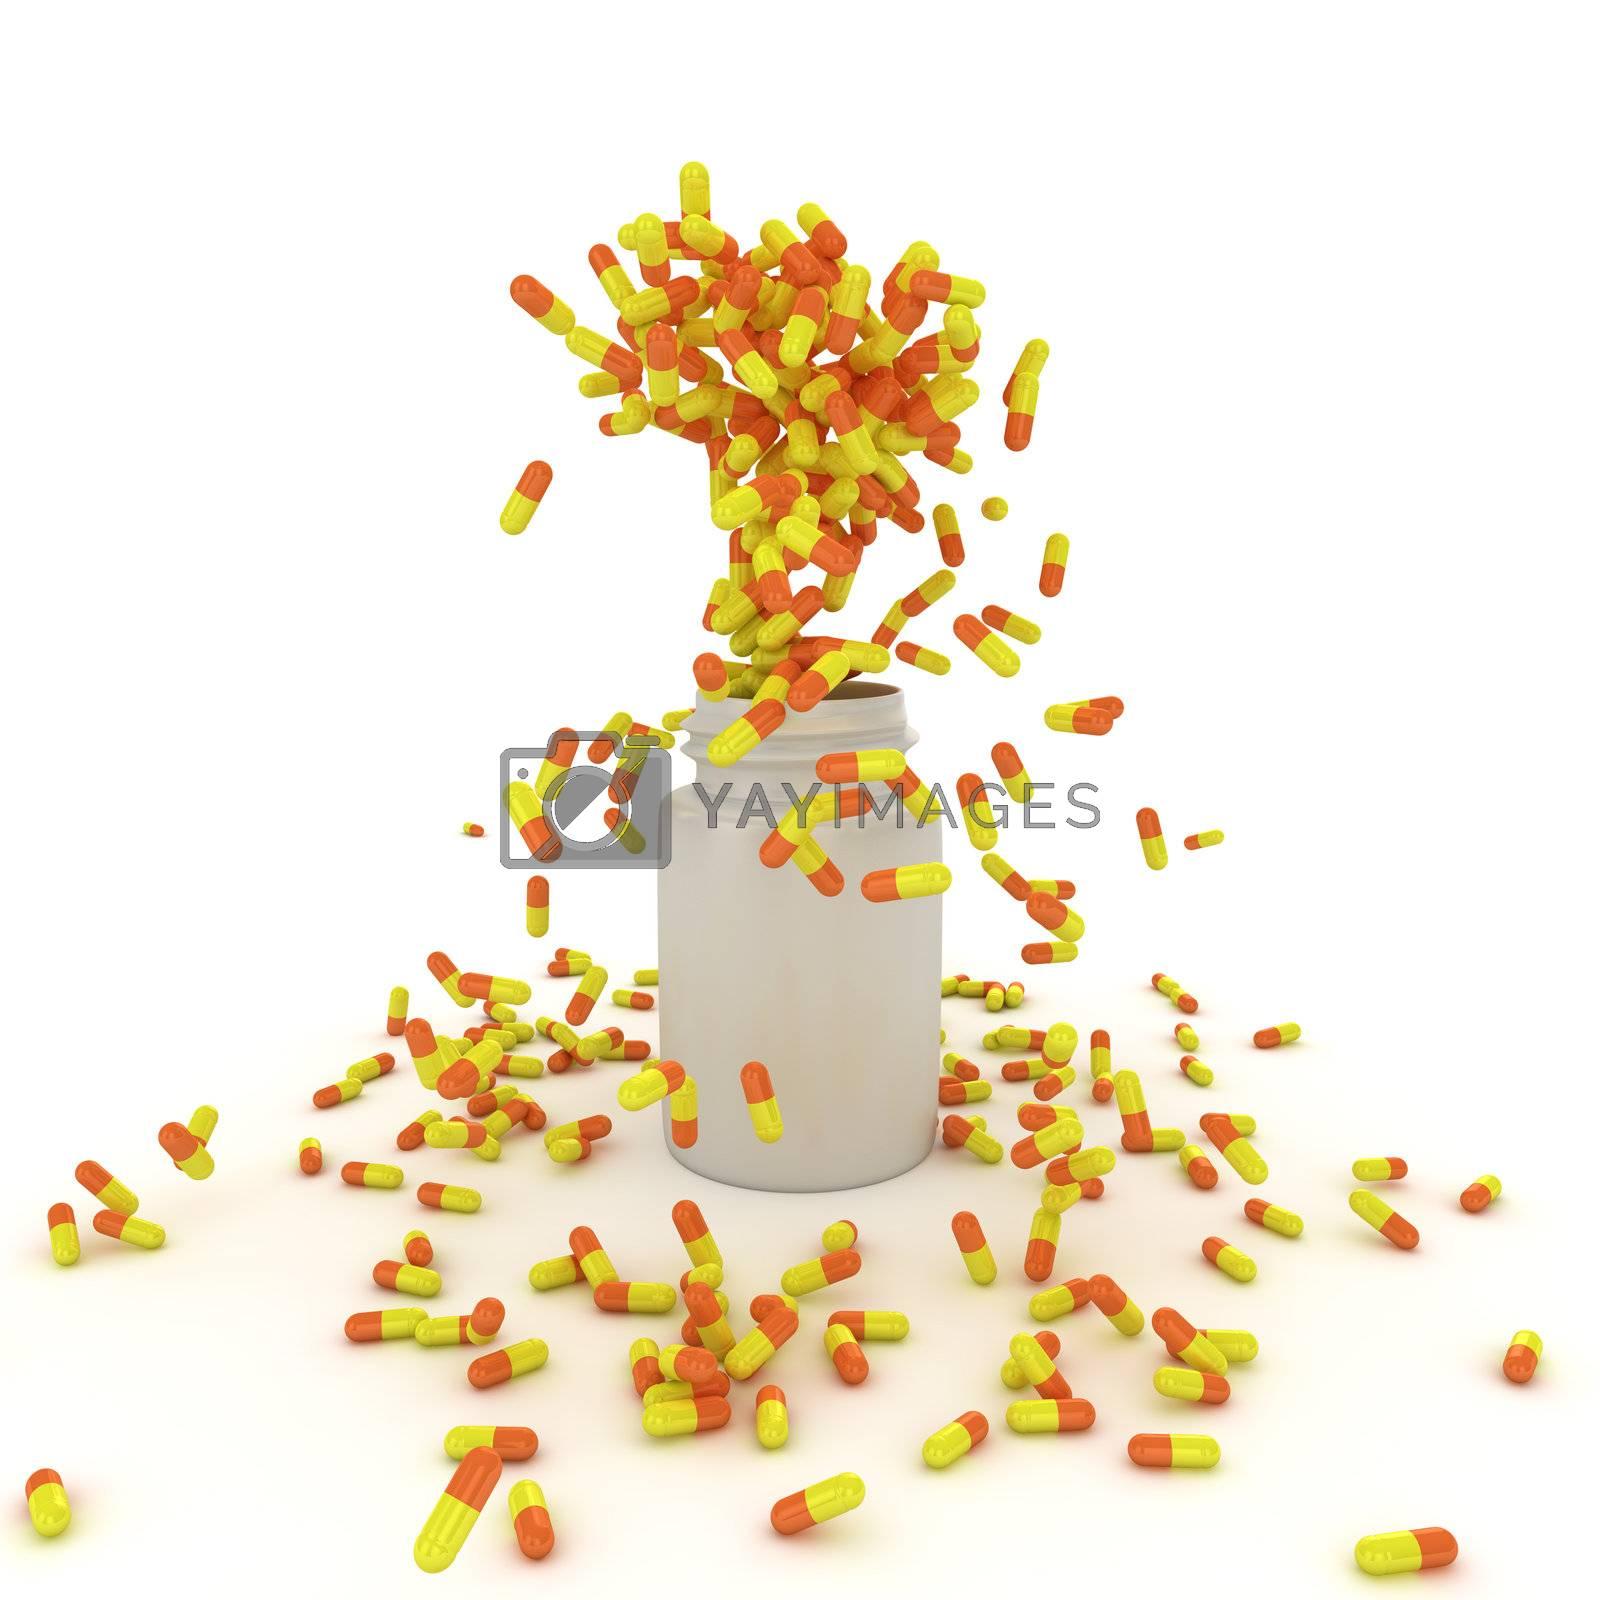 Explosion of yellow pills